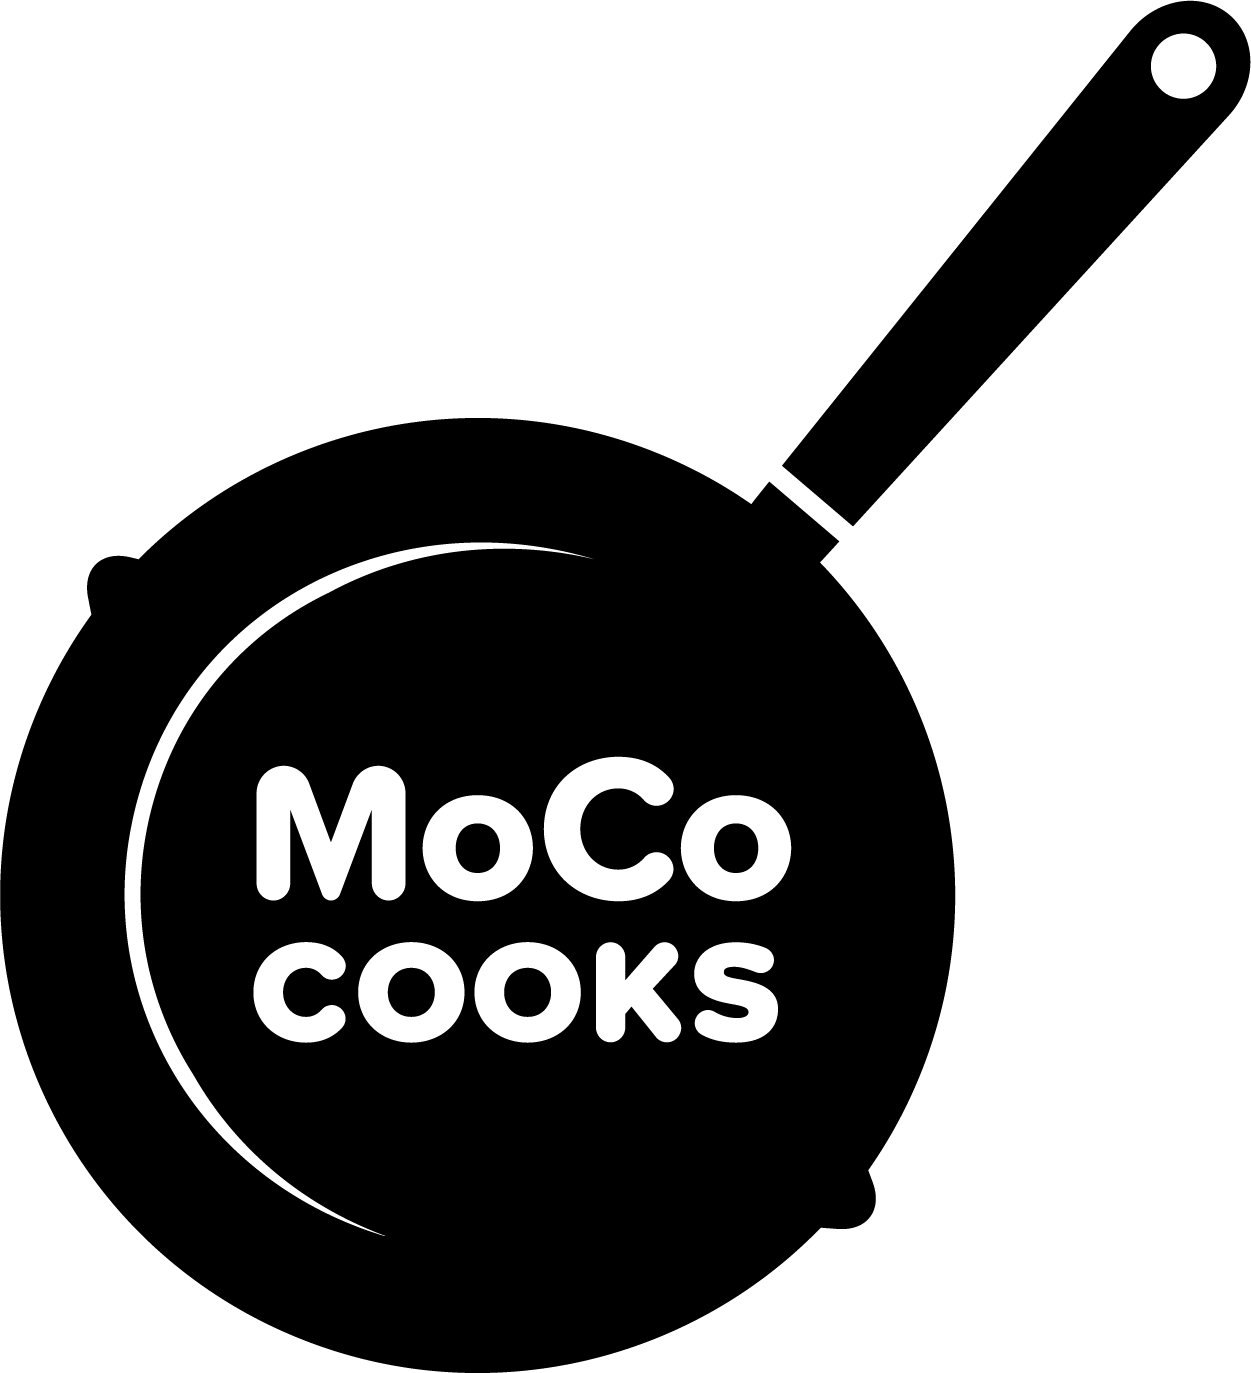 MoCo COOKS